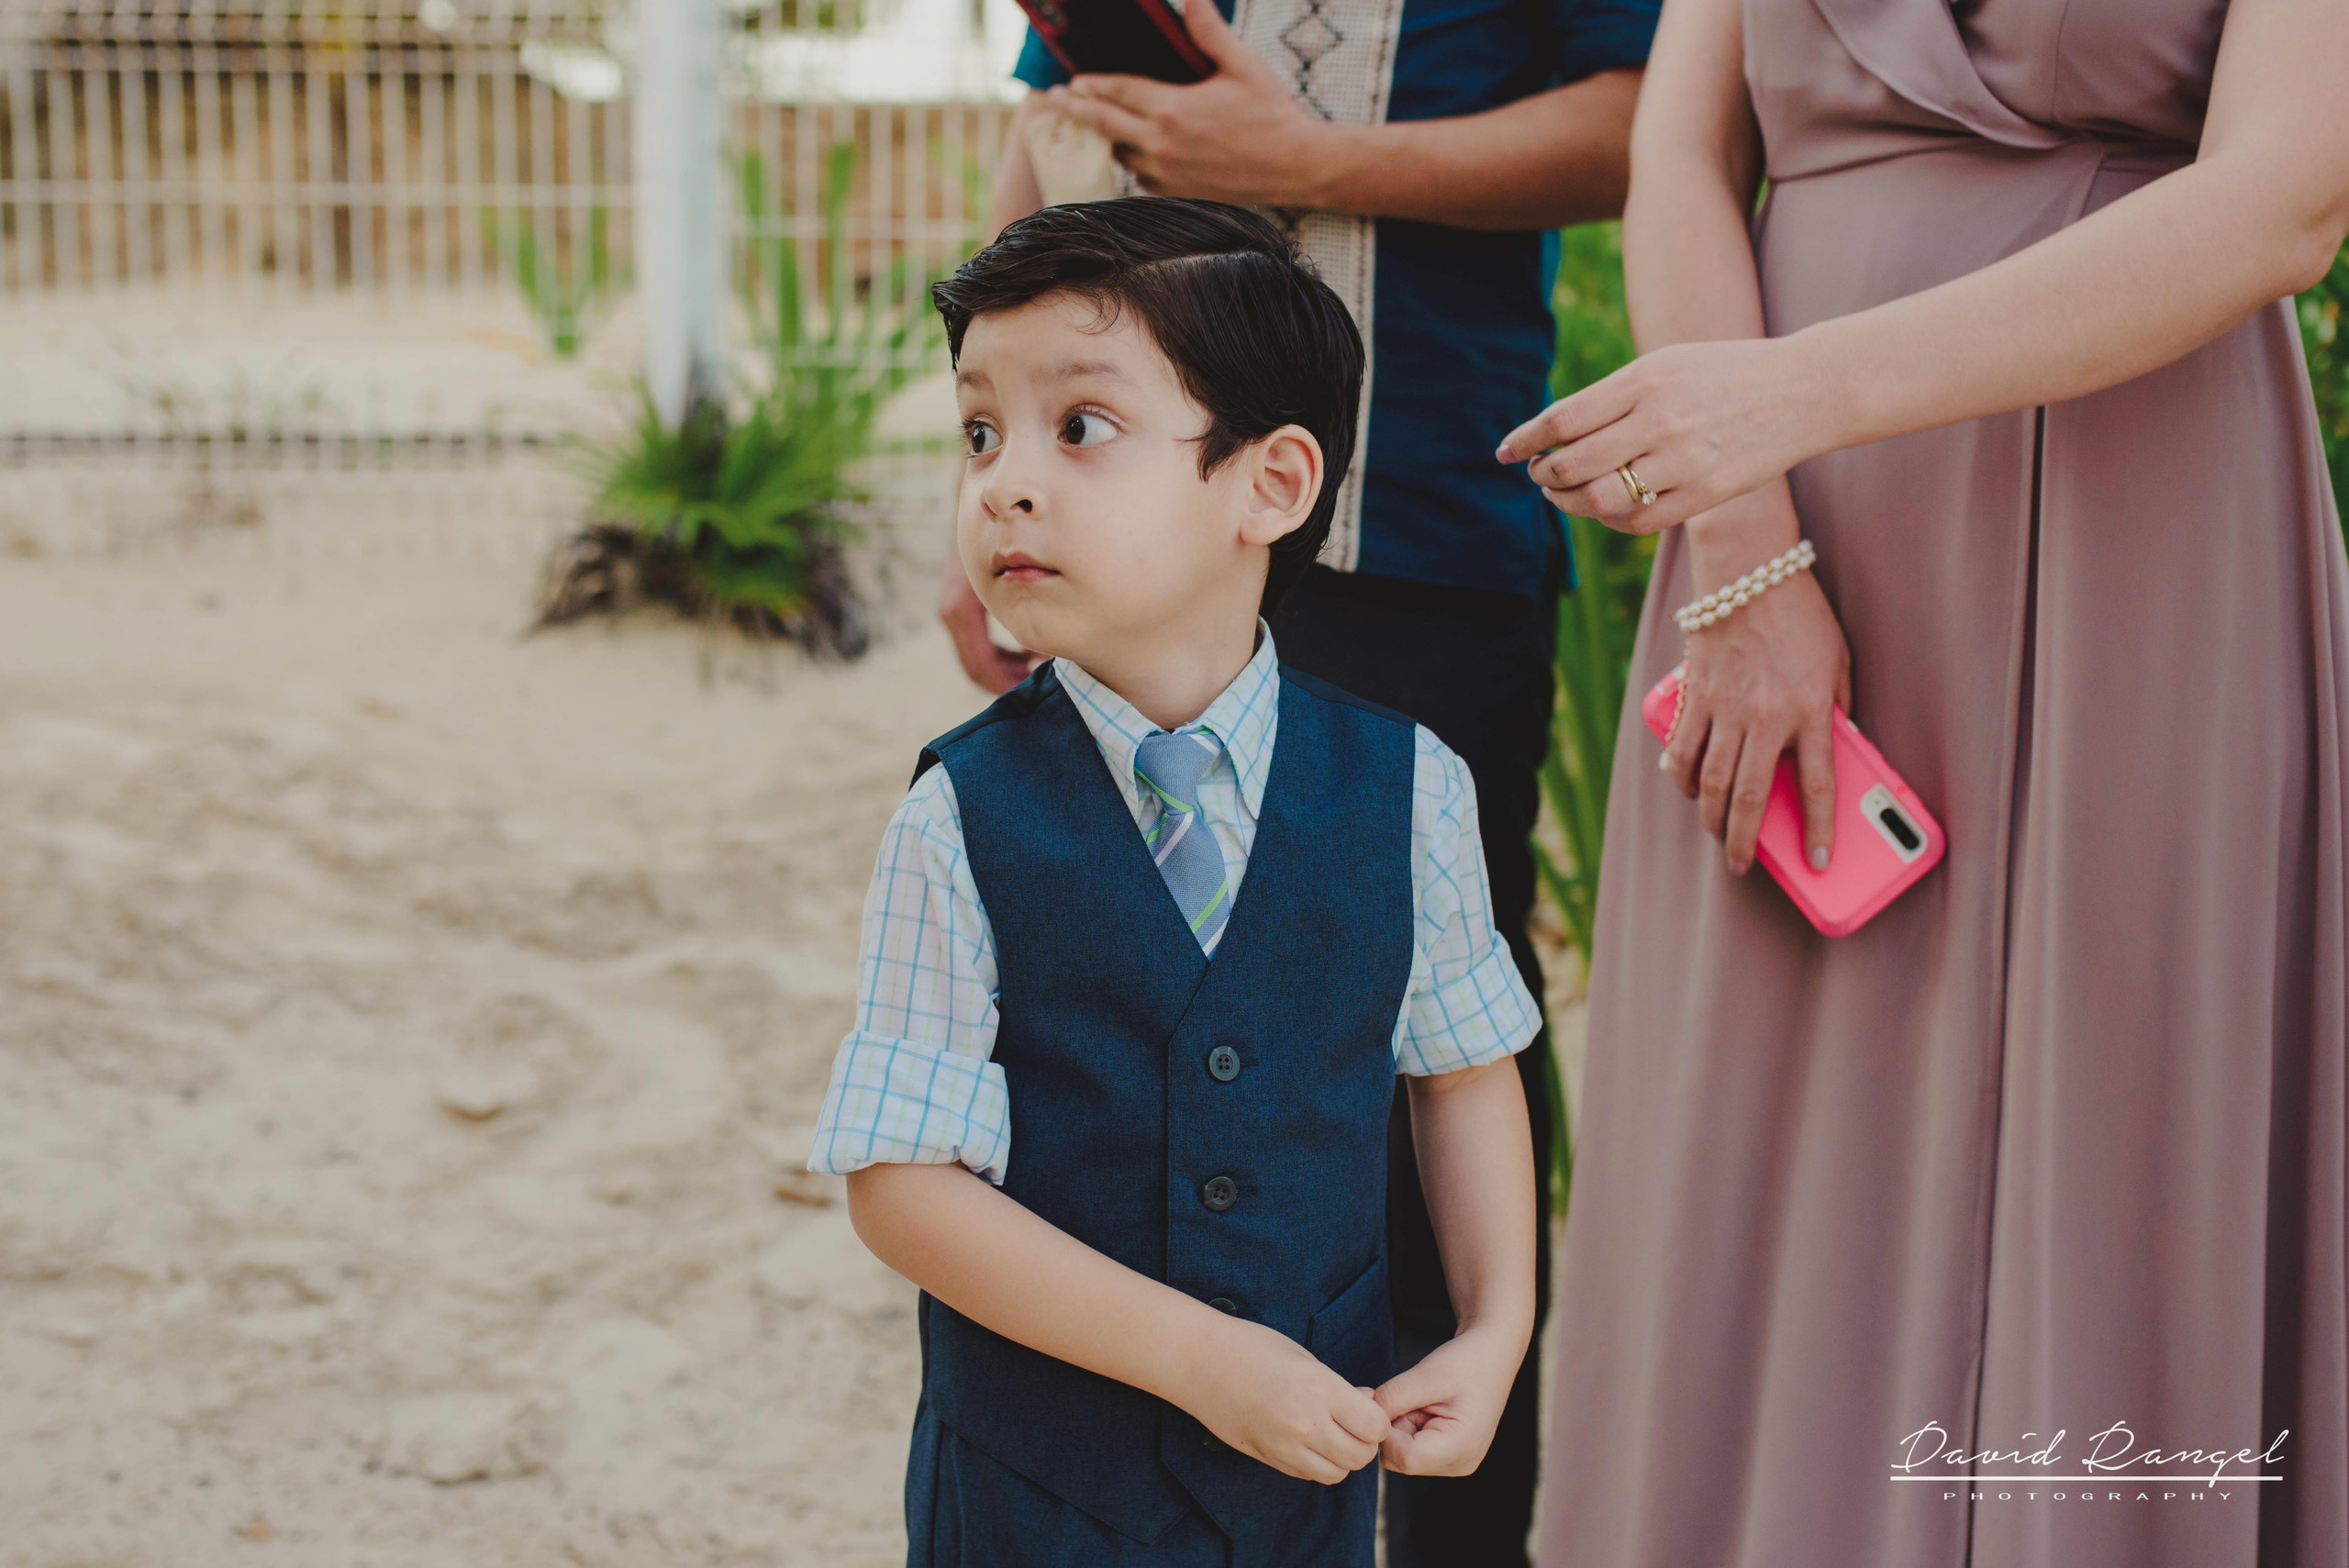 groom+bride+wedding+ceremony+dress+villa+chenera+isla+blanca+costa+mujeres+garden+beach+chaman+traditional+mayan+wedding+gazebo